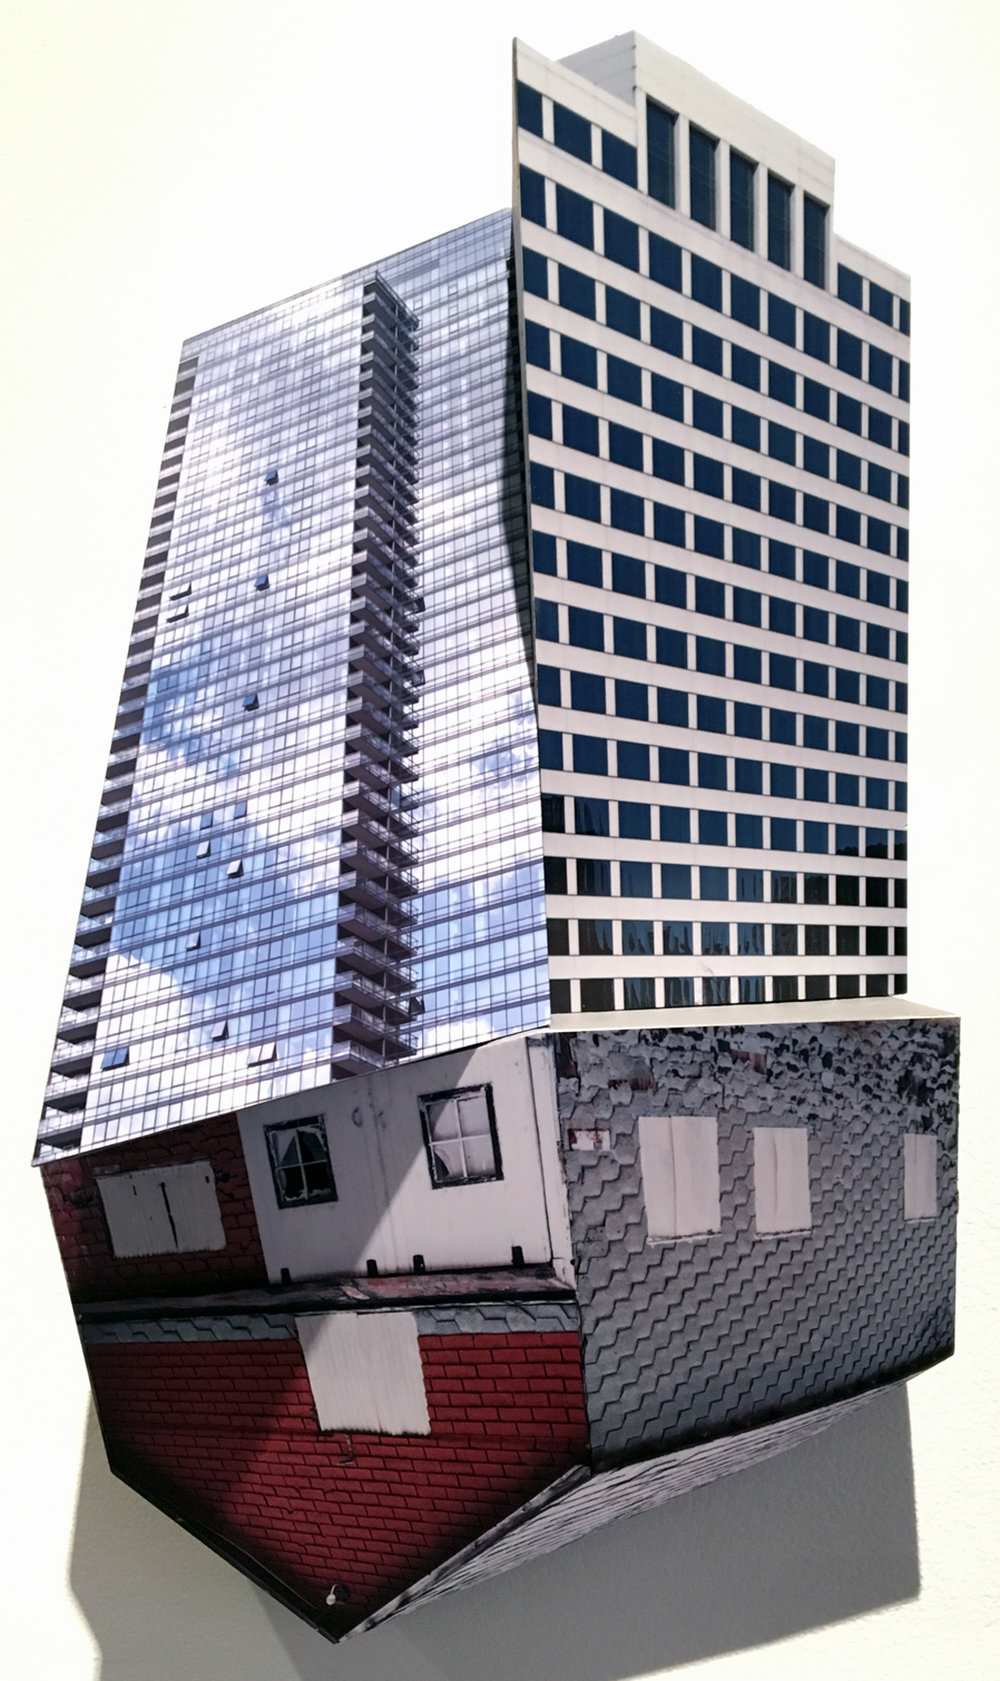 KRISTA SVALBONAS | Migrator 13, 17 x 10 x 4.5 inches / 43 x 25.4 x 11.5 cm, UV print on dibond on mdf, 2018